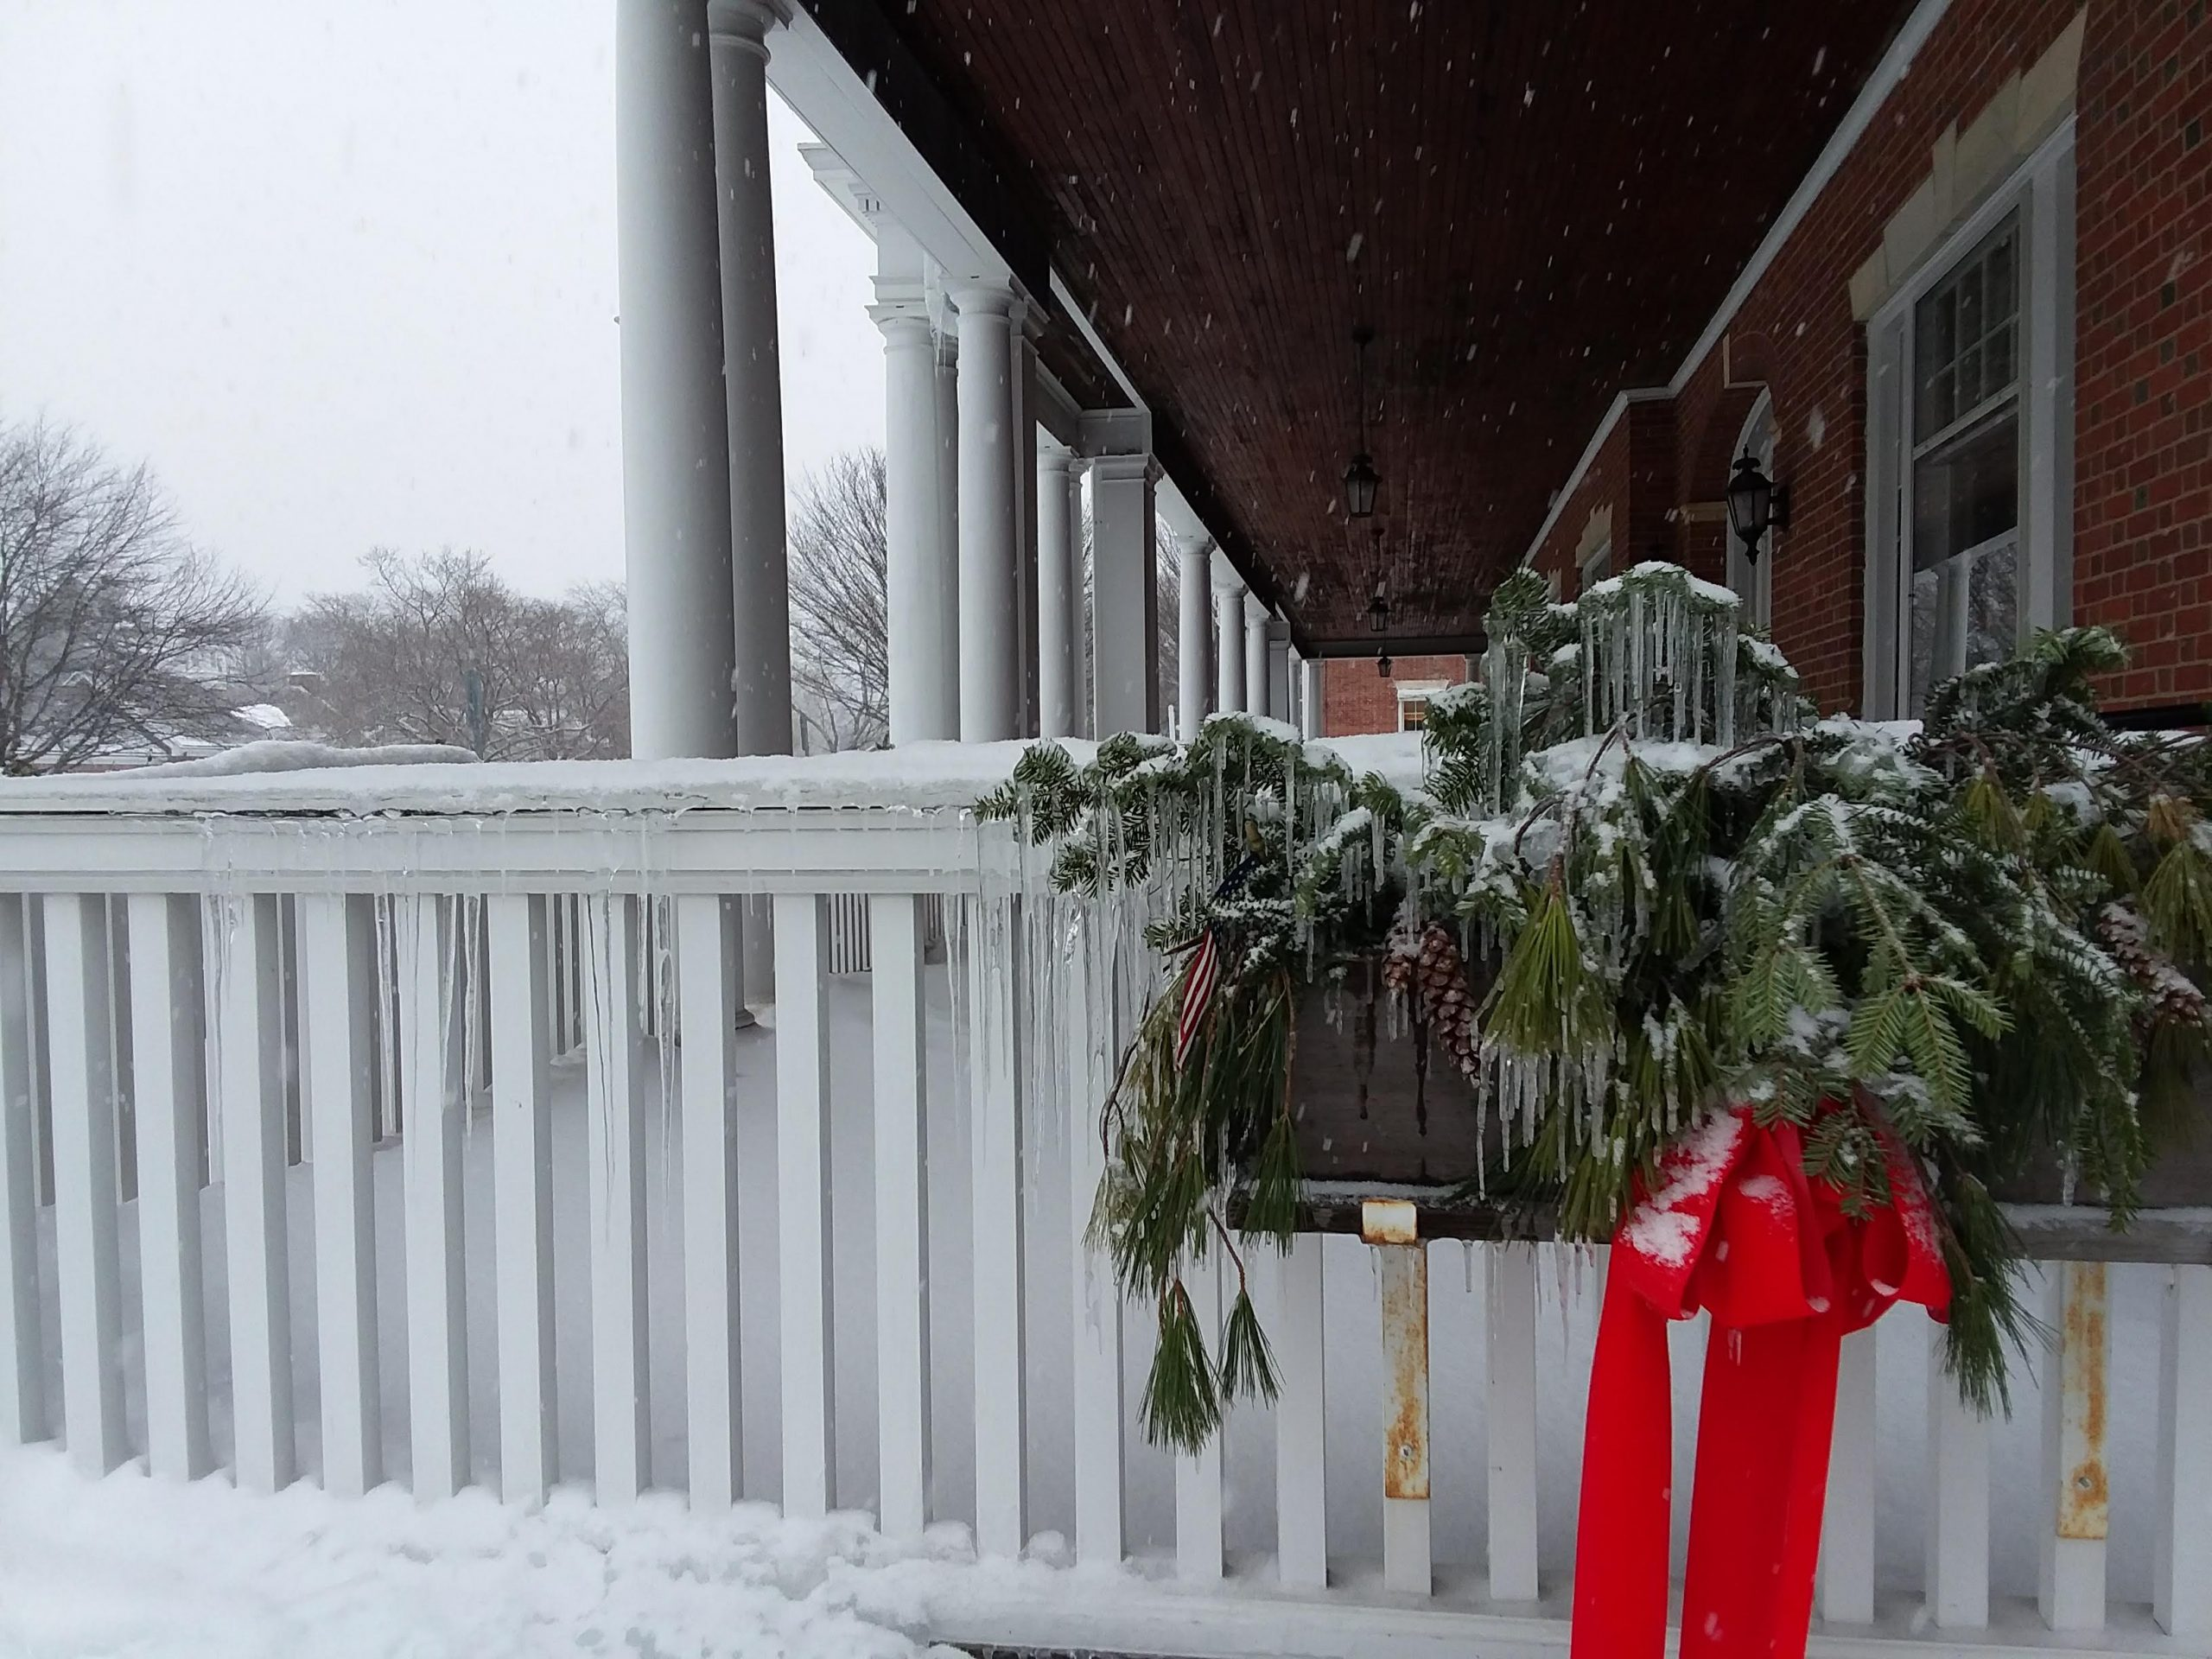 Curtis Hotel, Lenox, MA icy Christmas wreath.